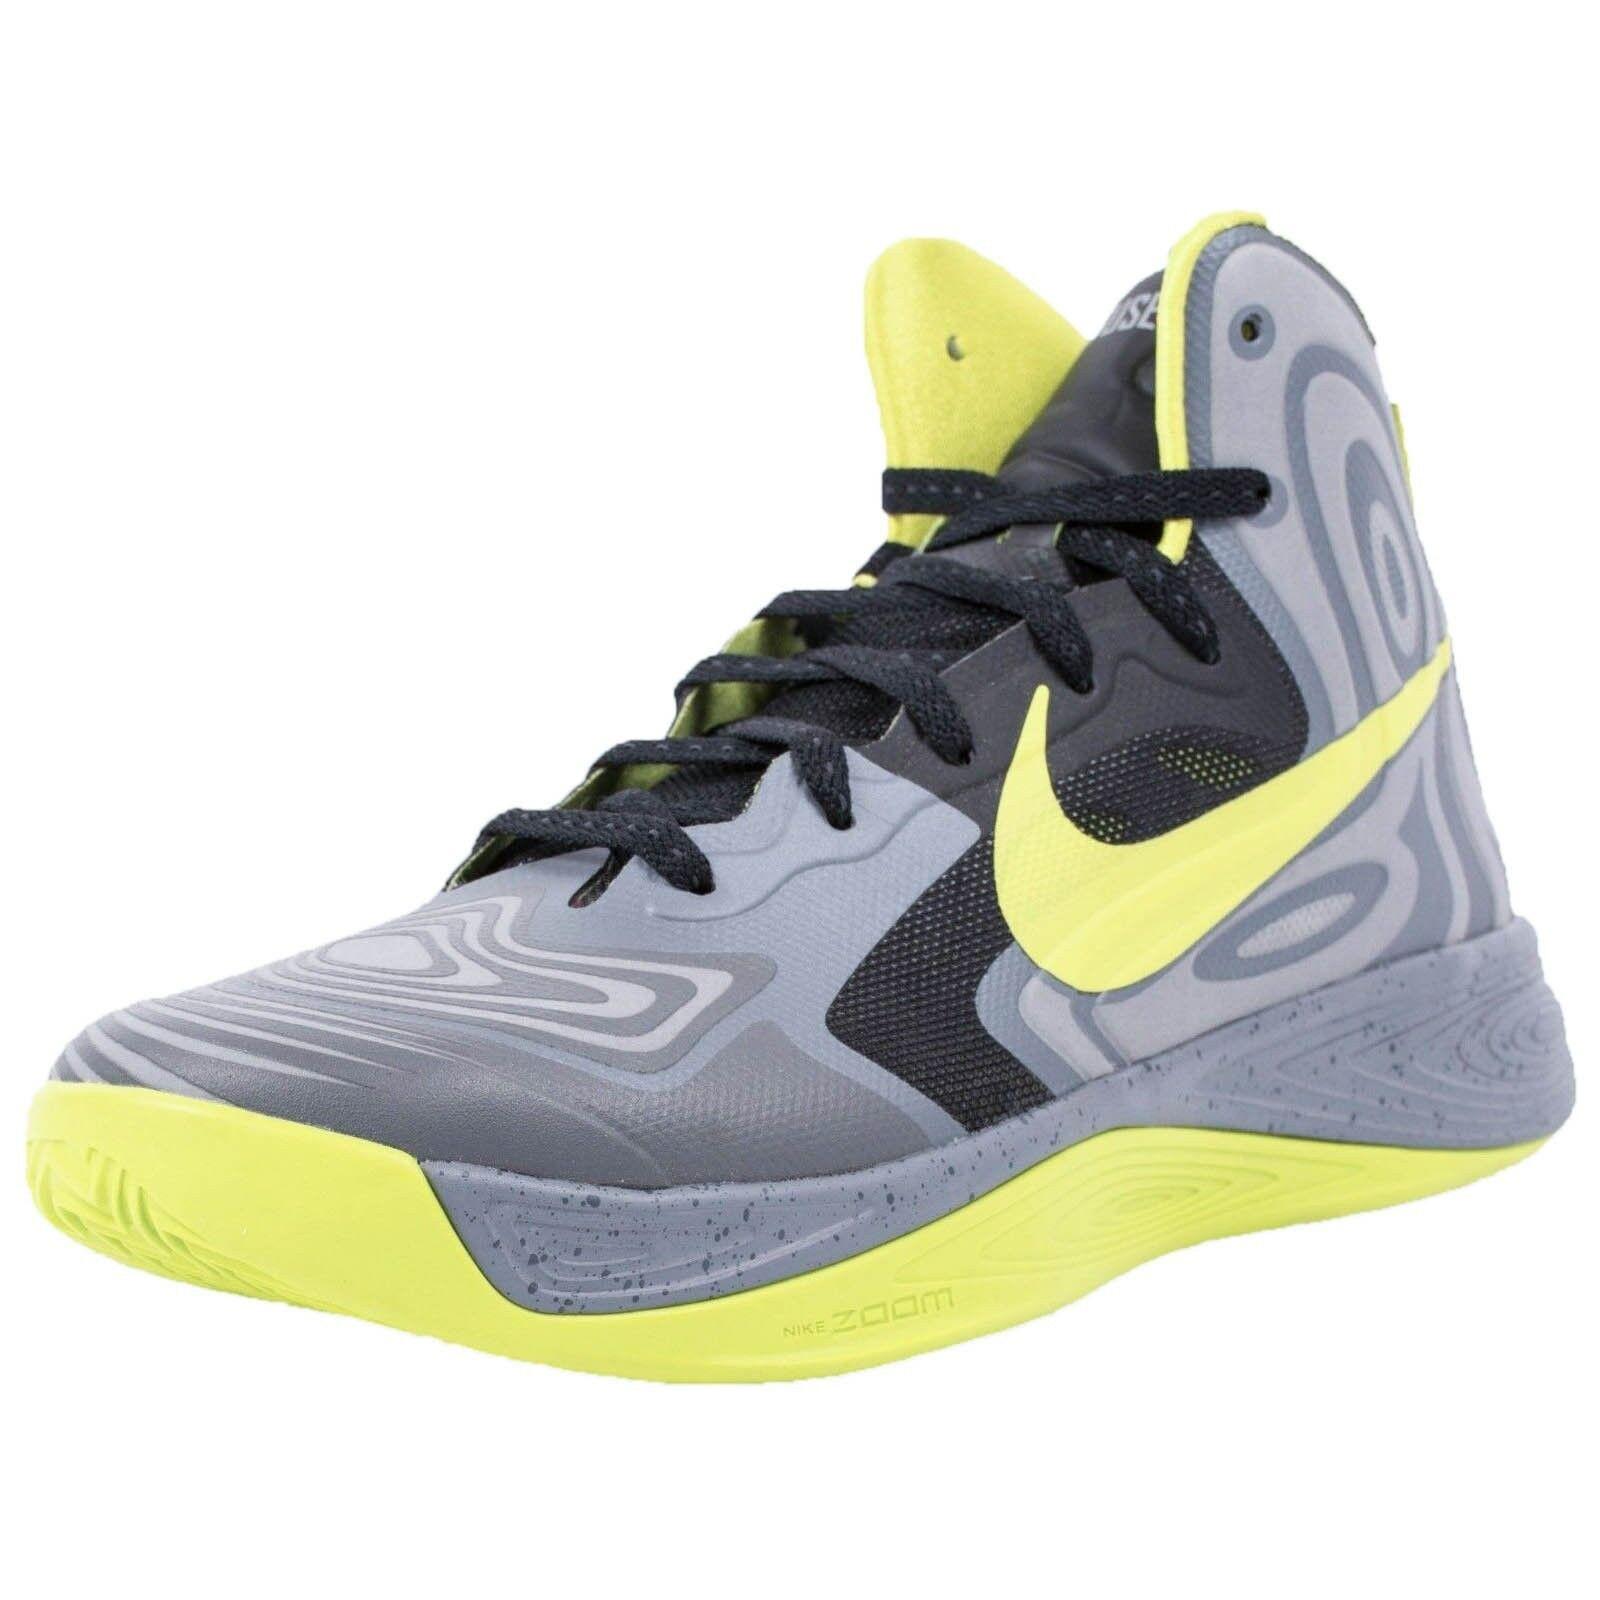 Nike hyperfuse supremo scarpe da basket dimensioni grey grn / blk 536861-001 atomica